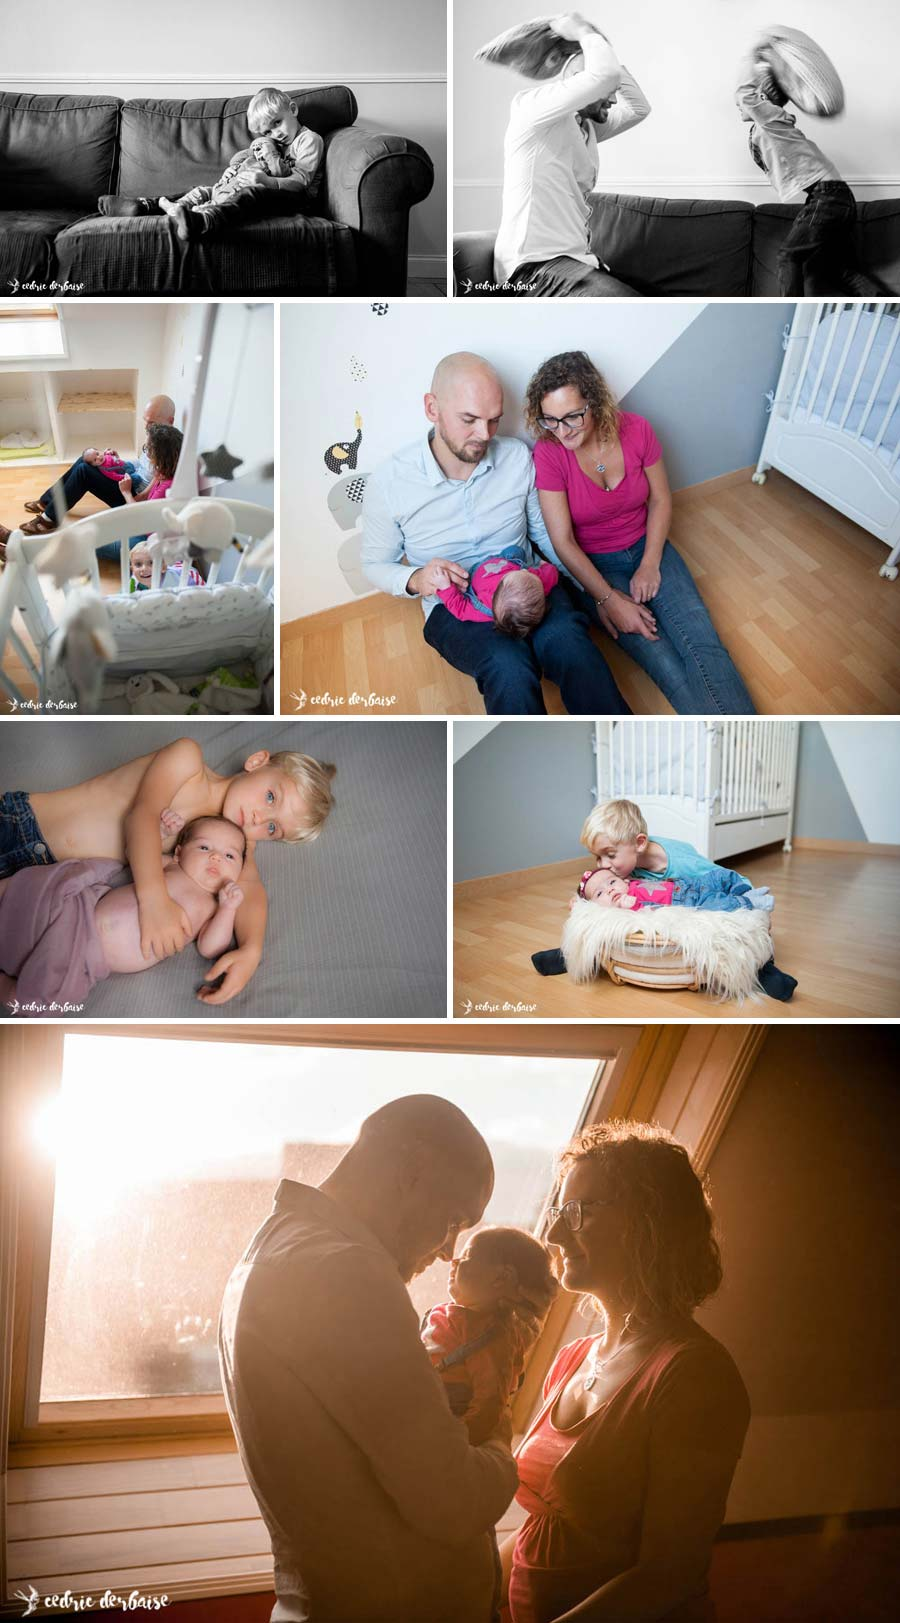 photographe oise famille a domicile